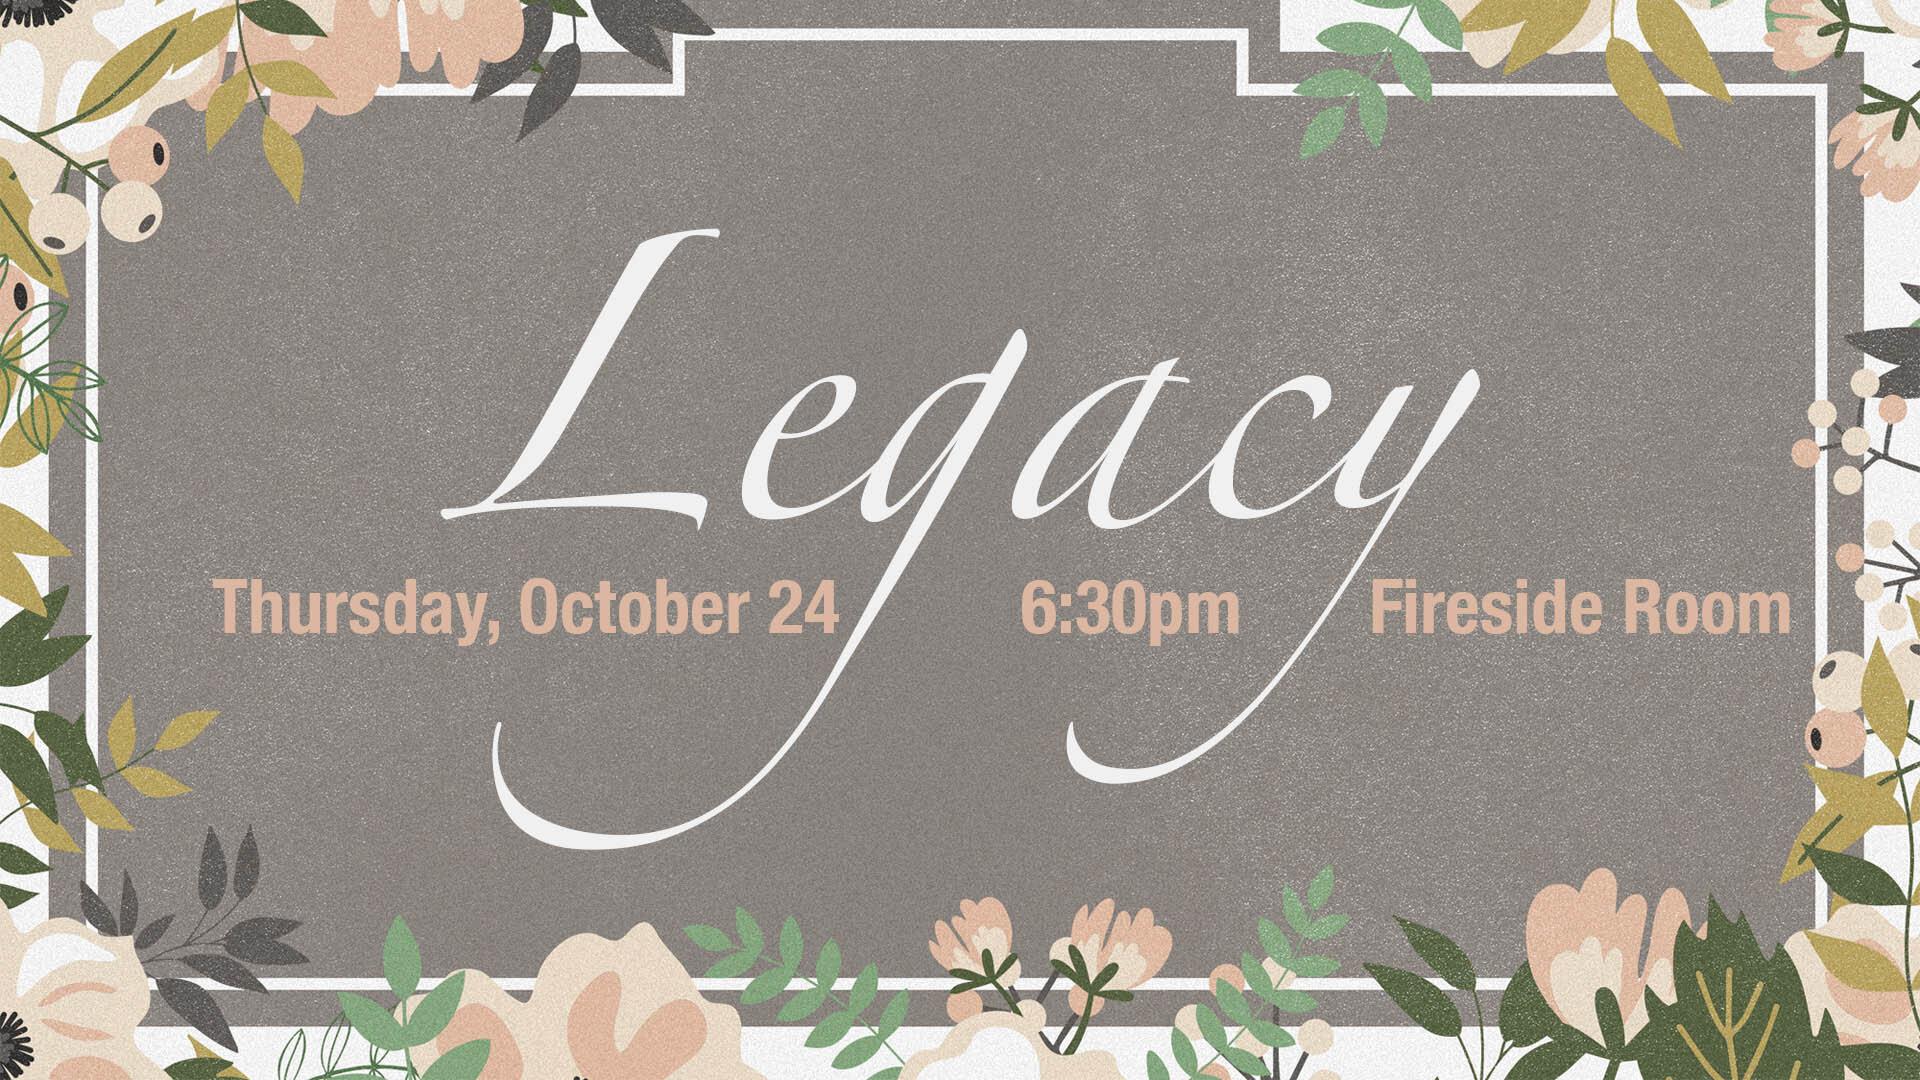 Legacy 10.24.19.jpg